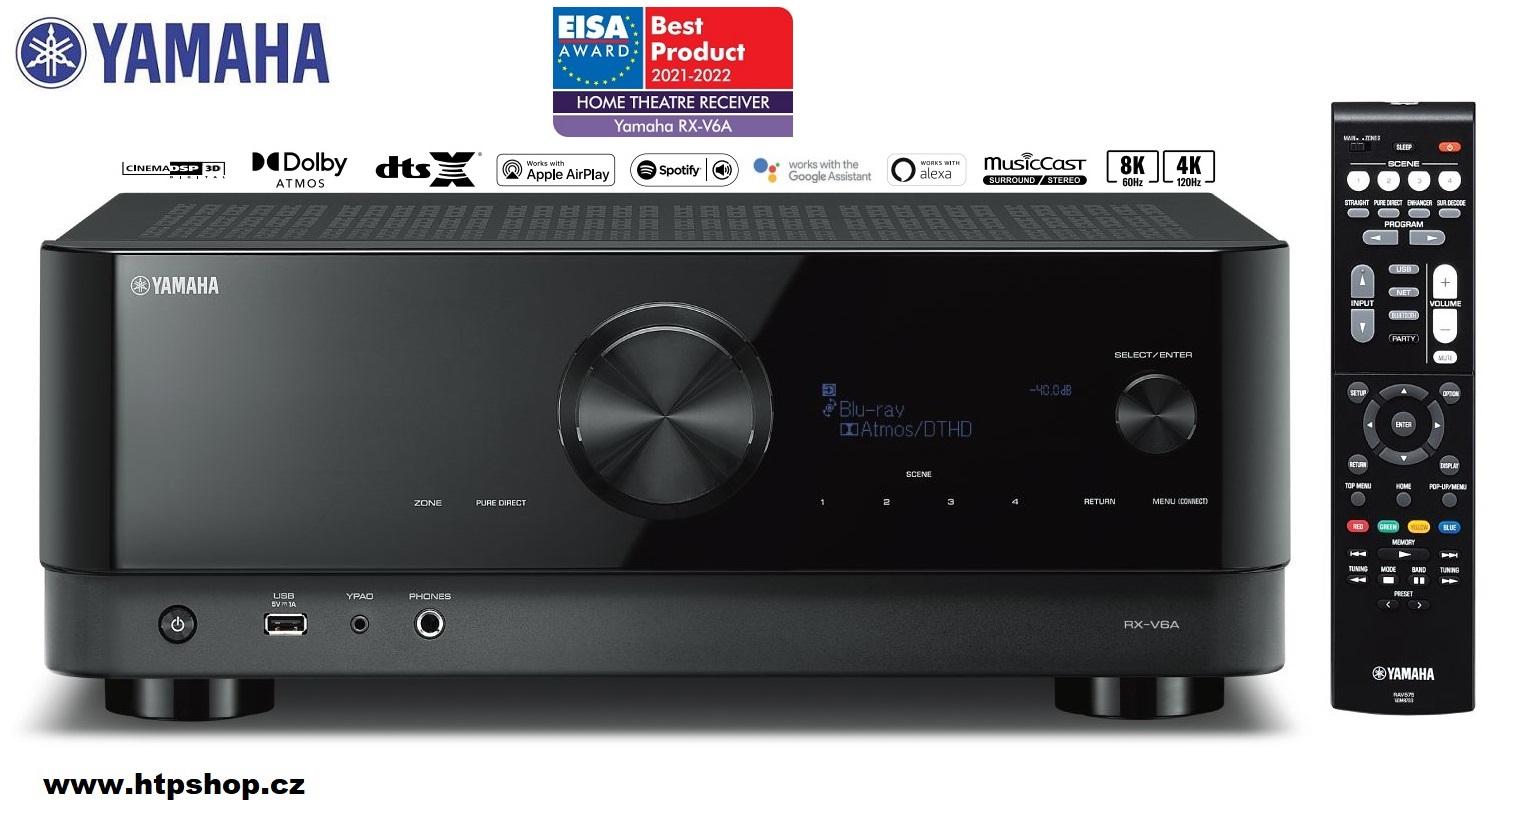 Yamaha RX-V6A - oceněno jako výrobek roku EISA AWARD 2021-2022 v kategorii Home Theatre Receiver